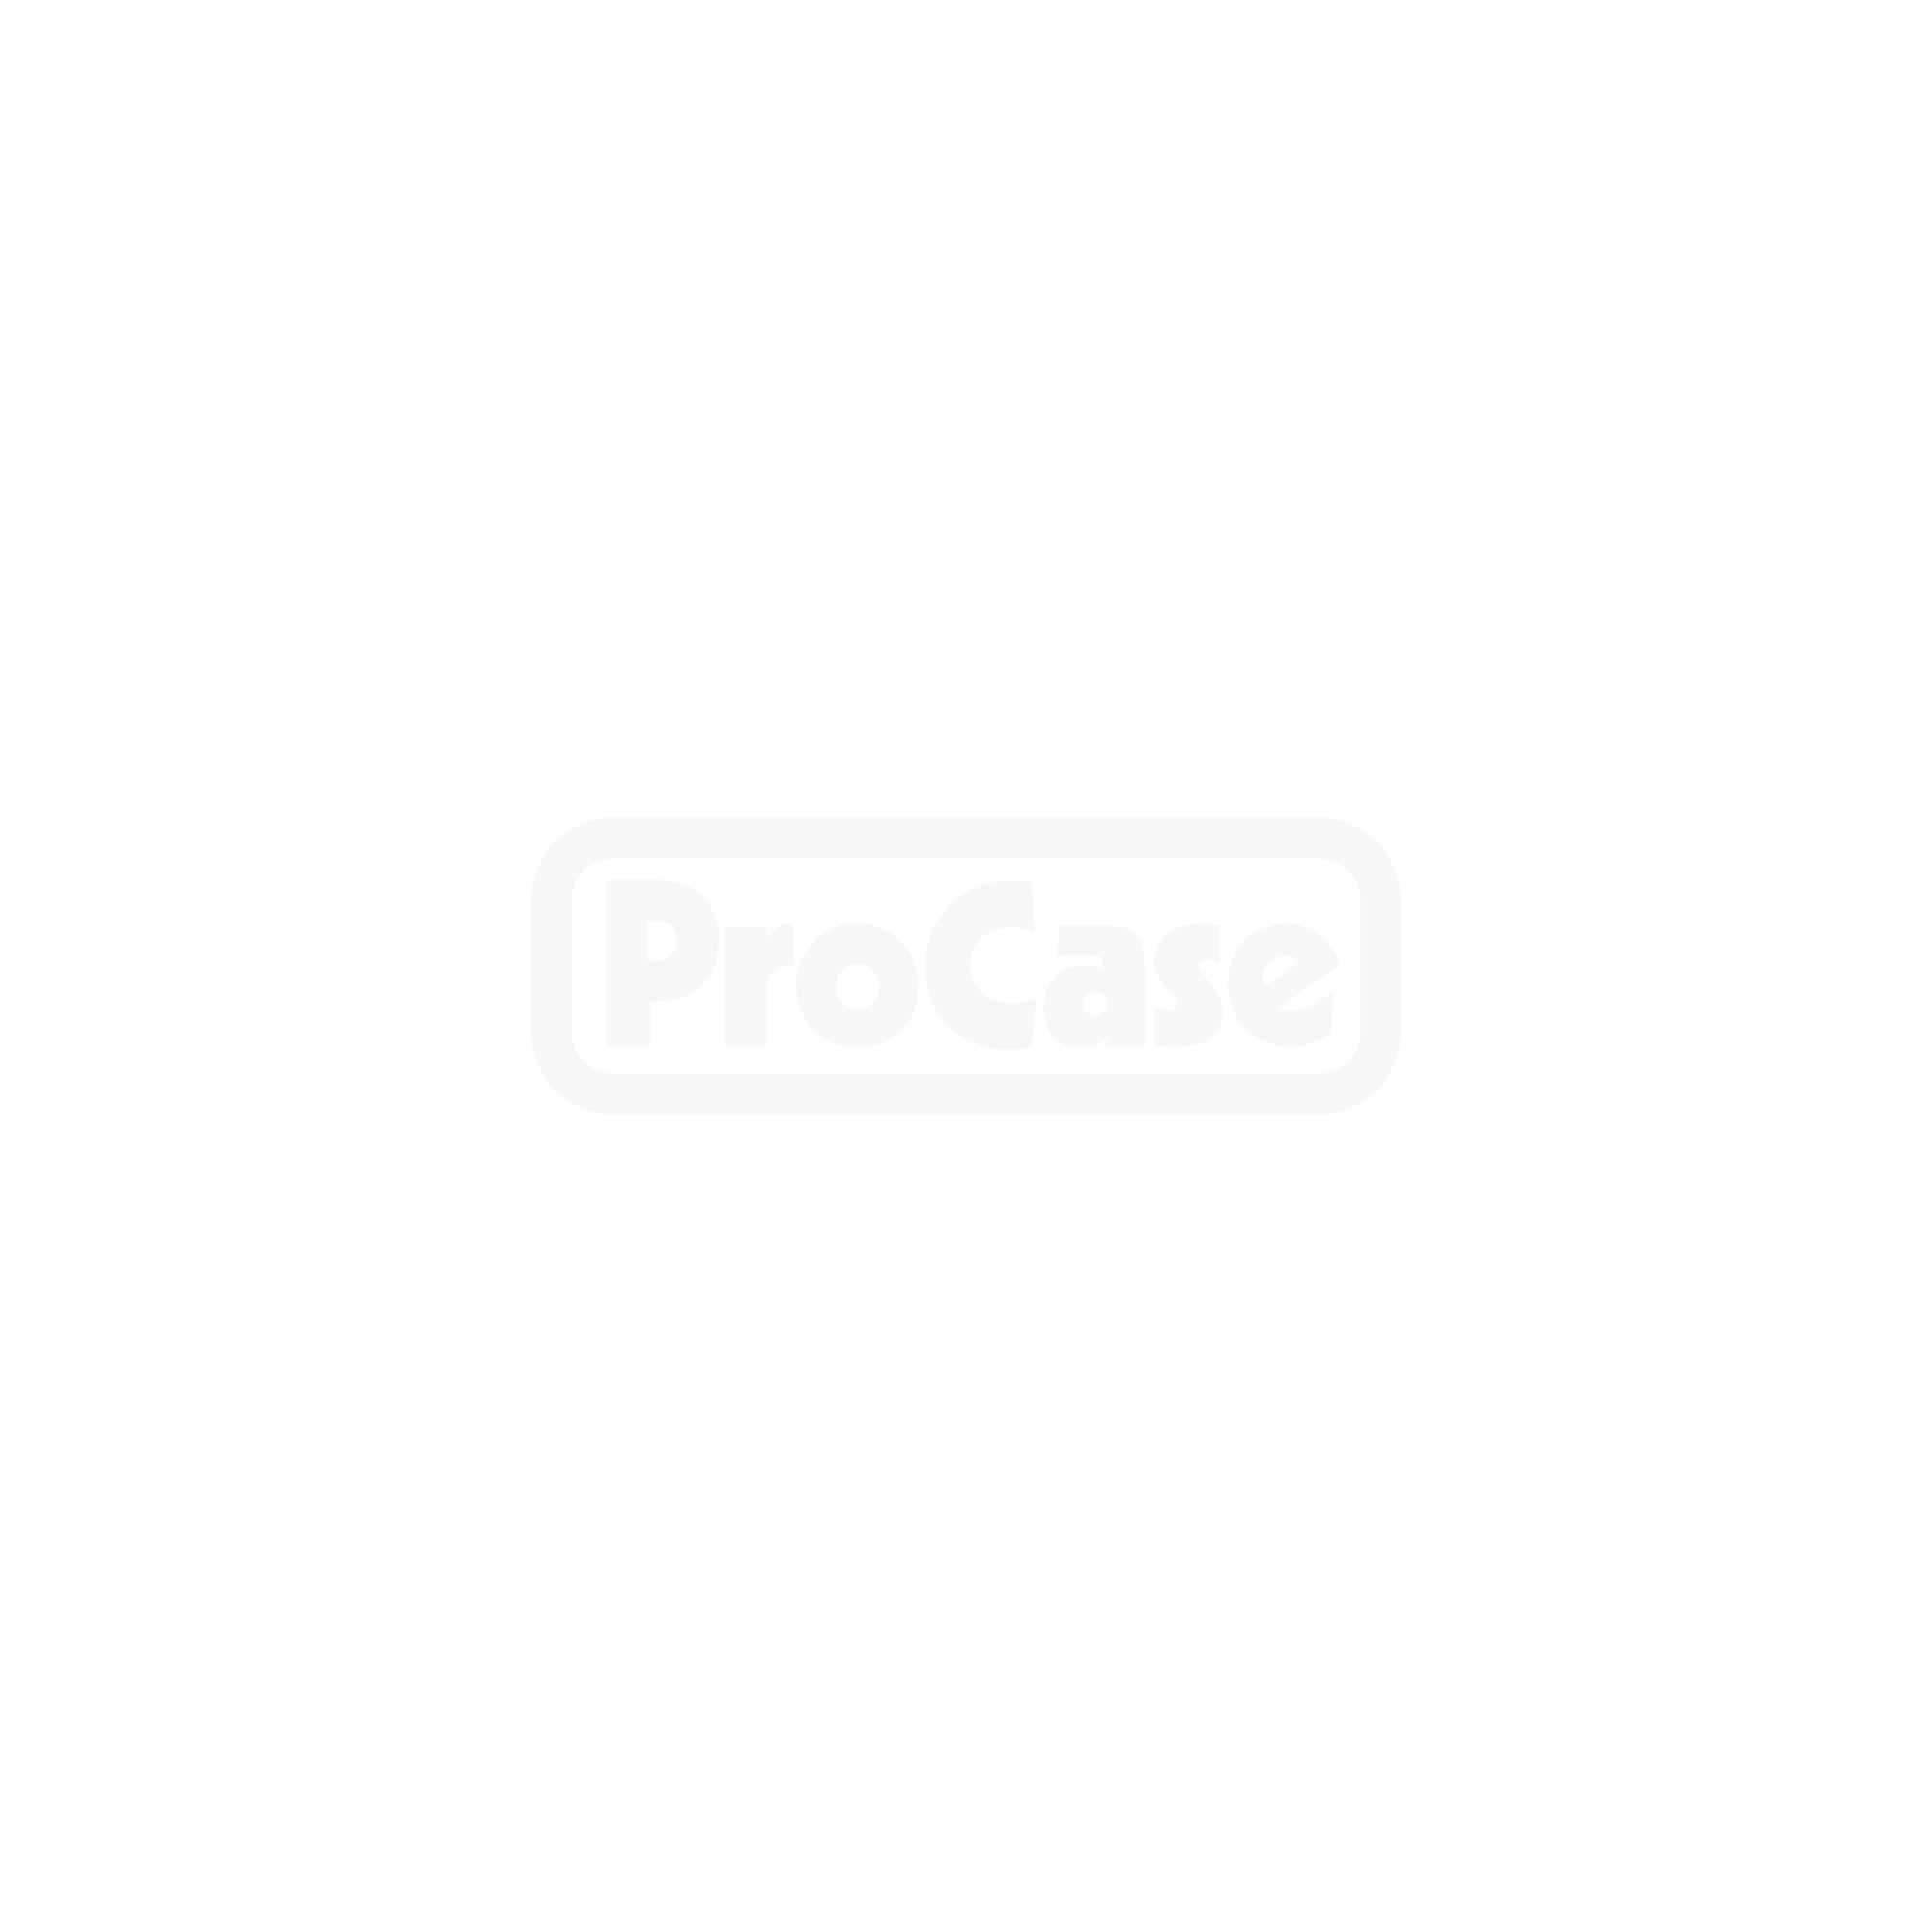 Flightcase für 6 Barco iLite LED-Module